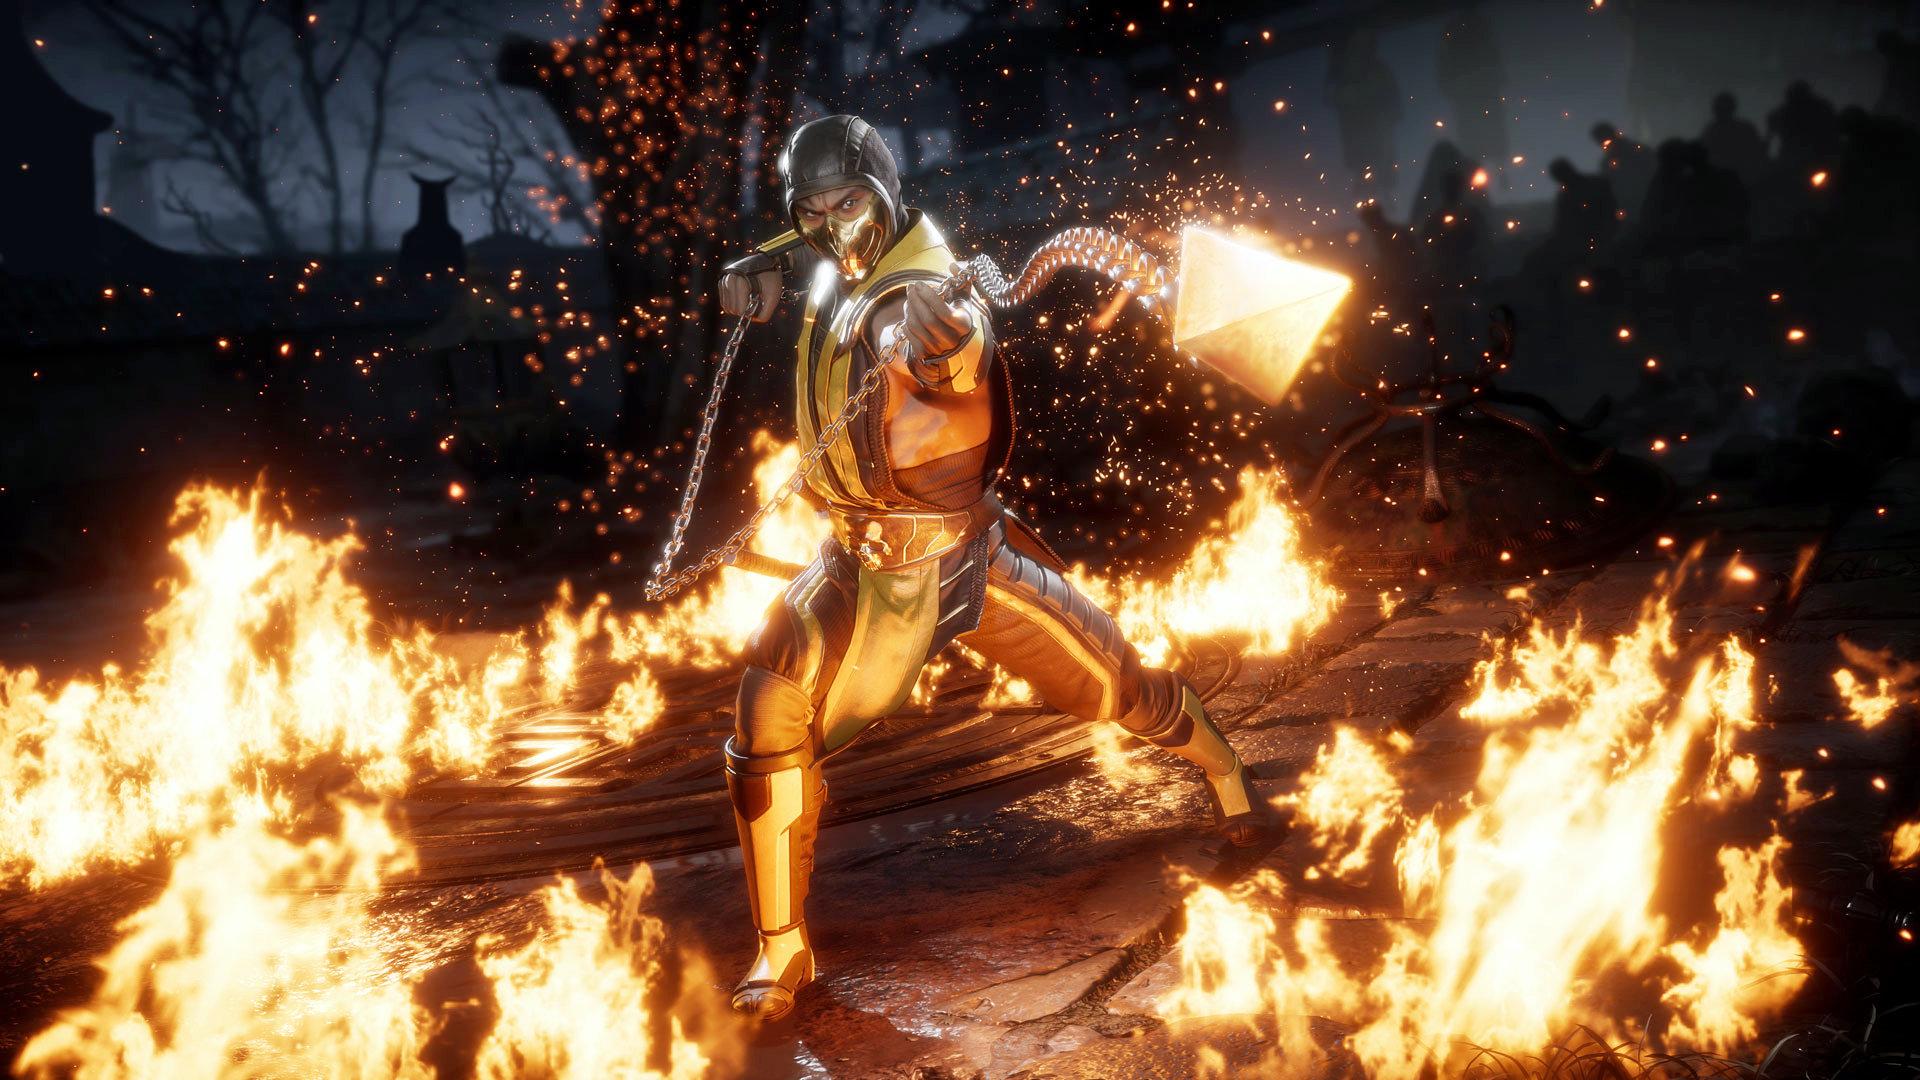 Mortal Kombat 11 - Scorpion Spear Angriff